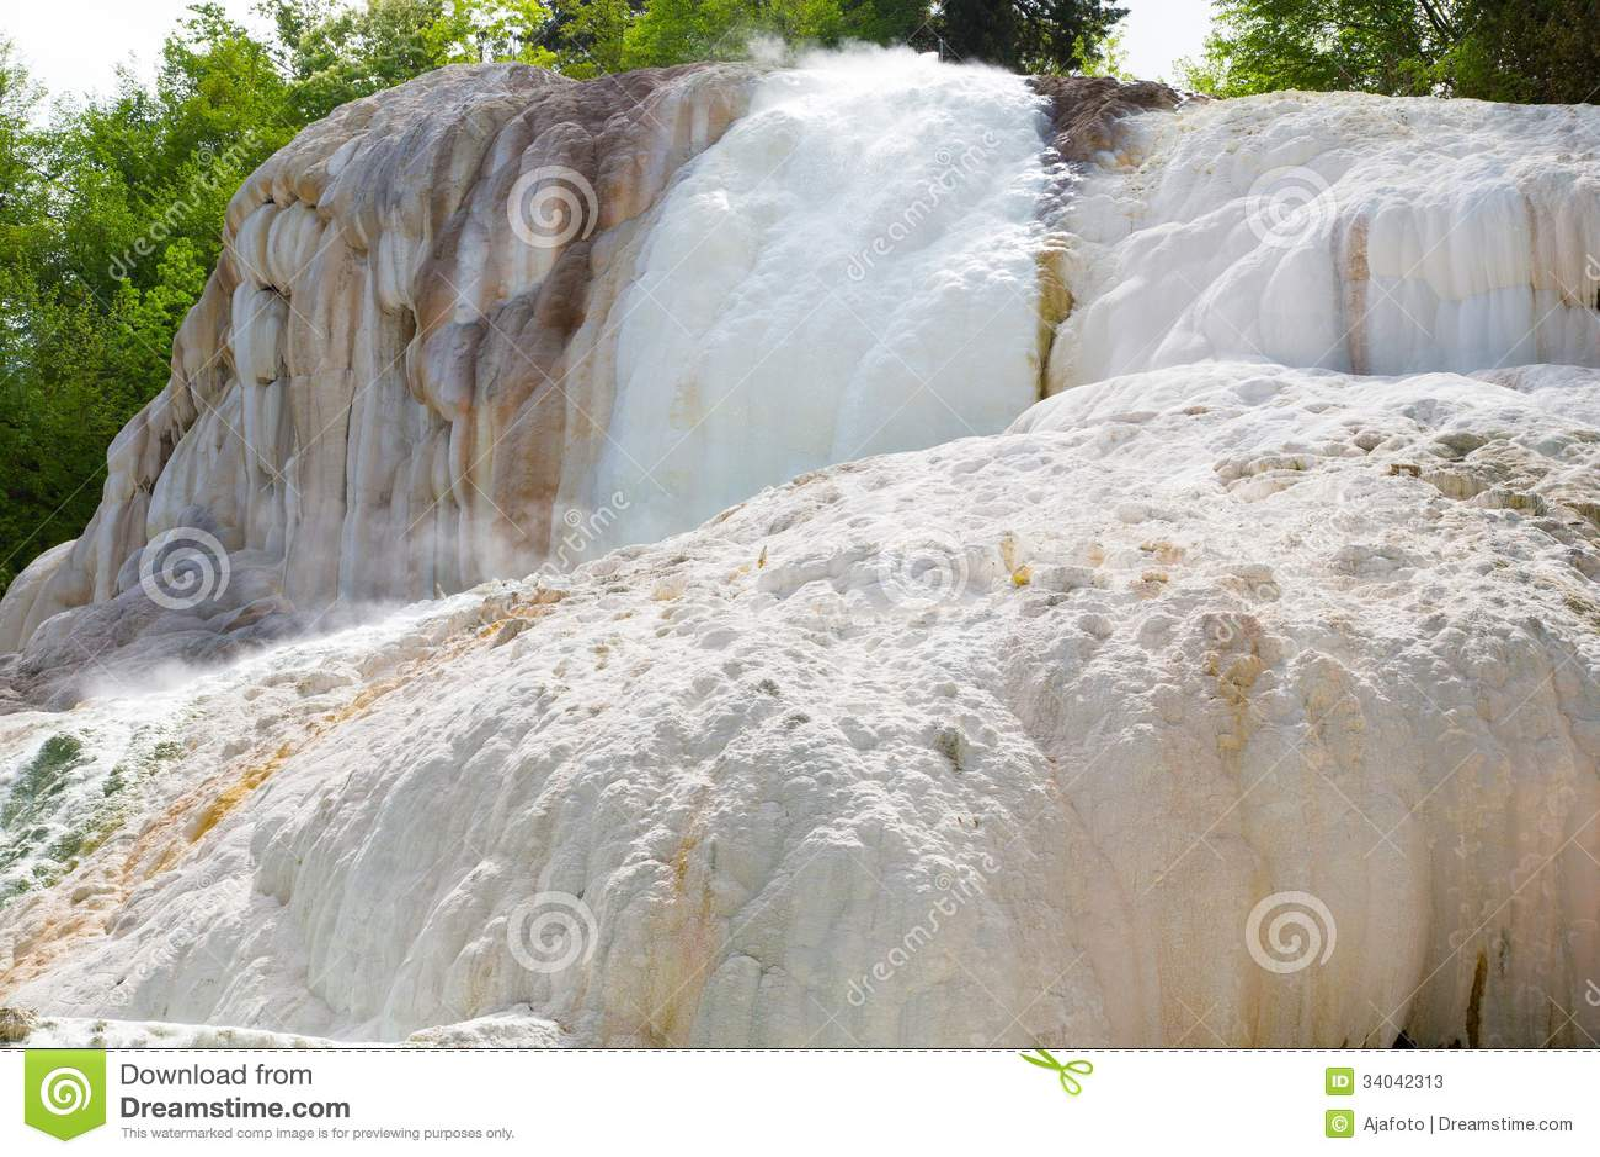 Aguas termales de Fosso Bianco en Bagni San Filippo